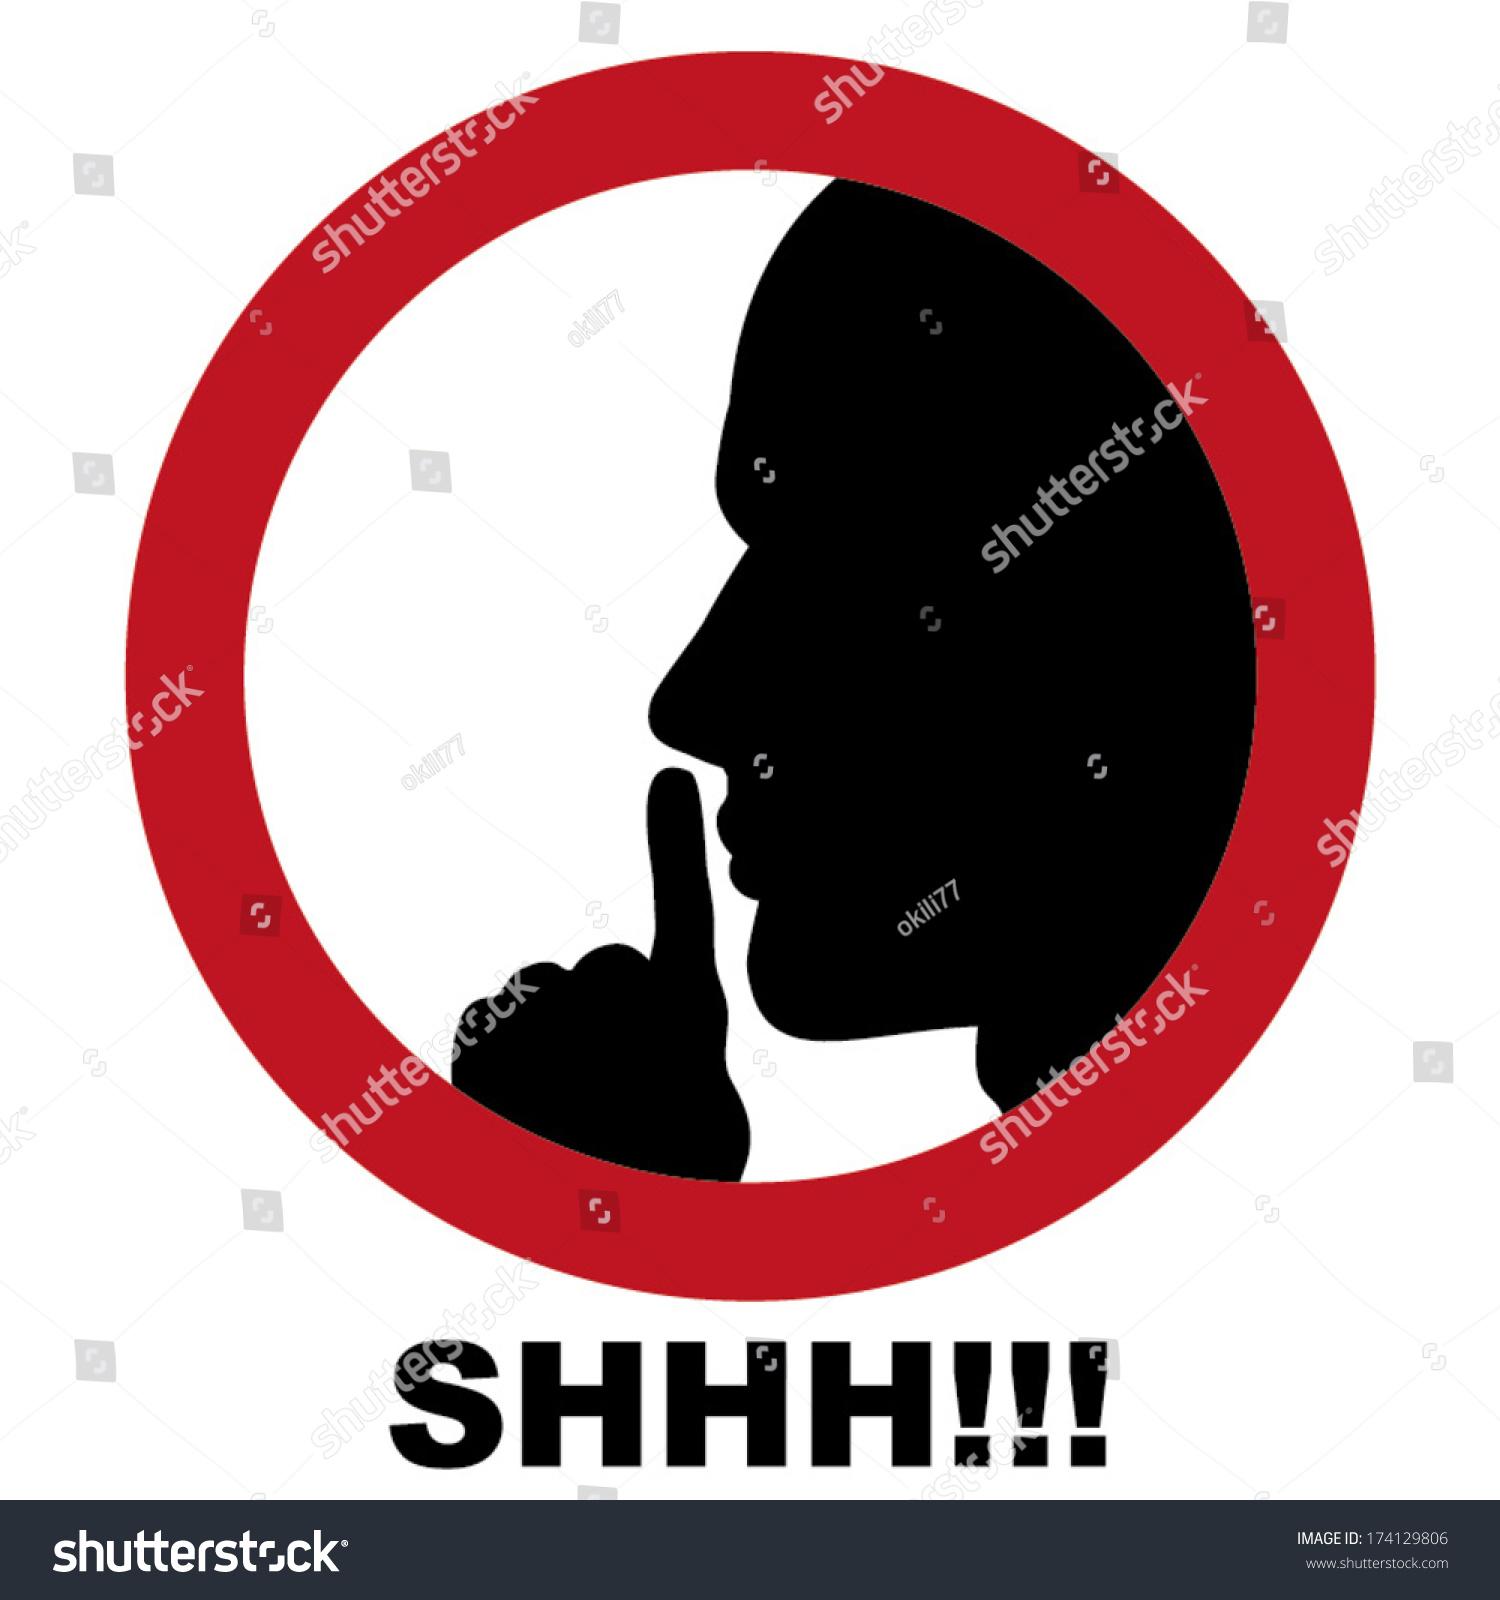 Shhh Sign Vector - 174129806 :...